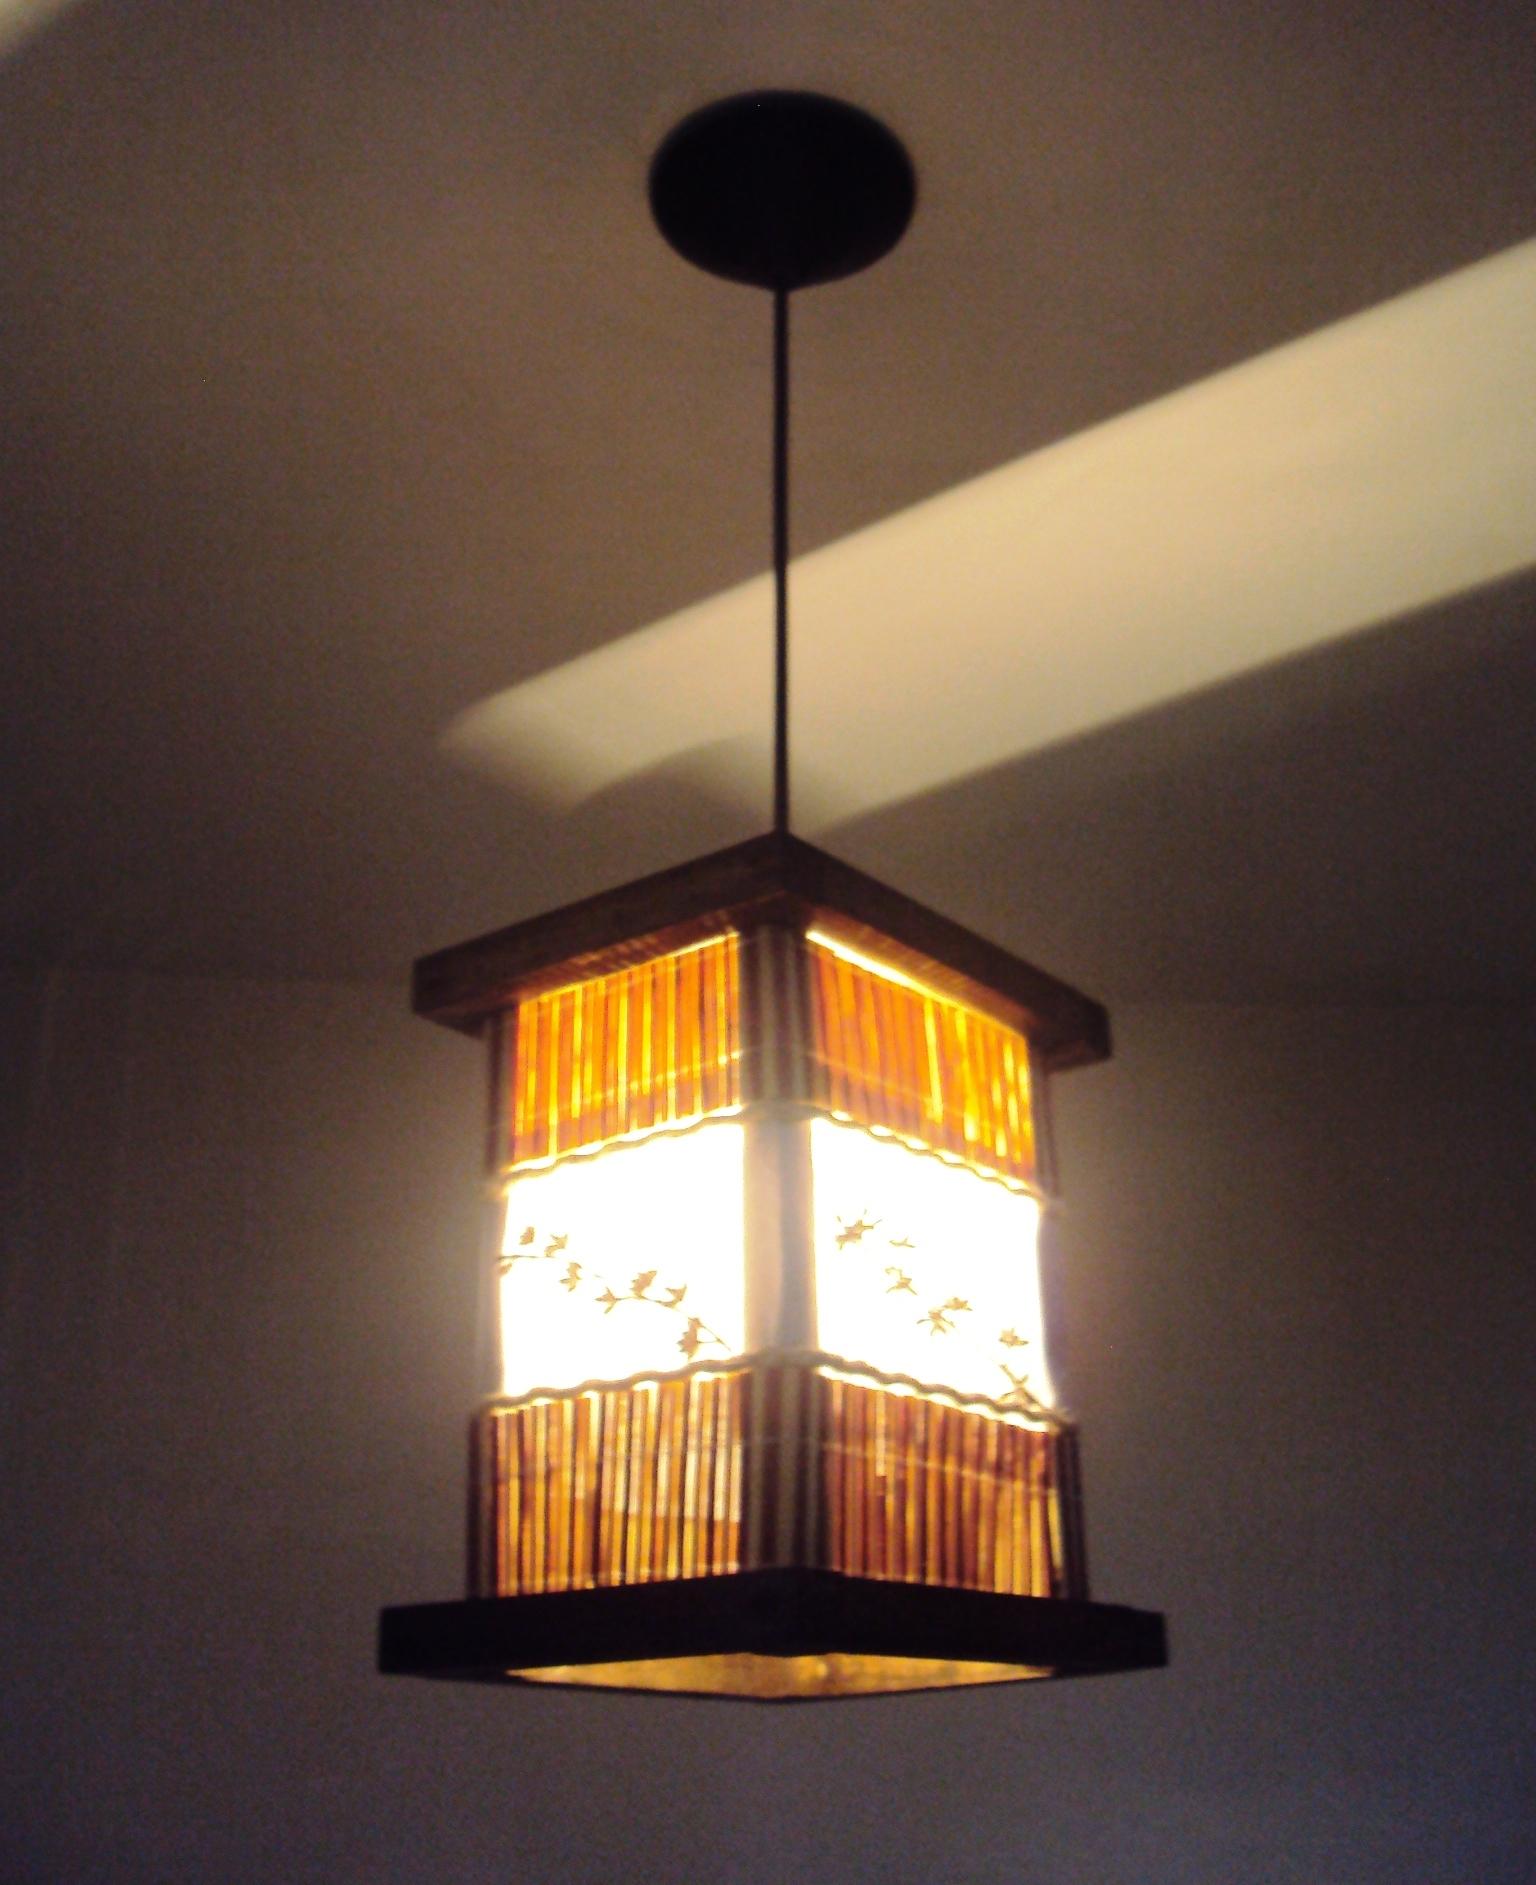 de teto lustre rustico bambu luminaria de teto lustre rustico bambu #C59506 1536x1885